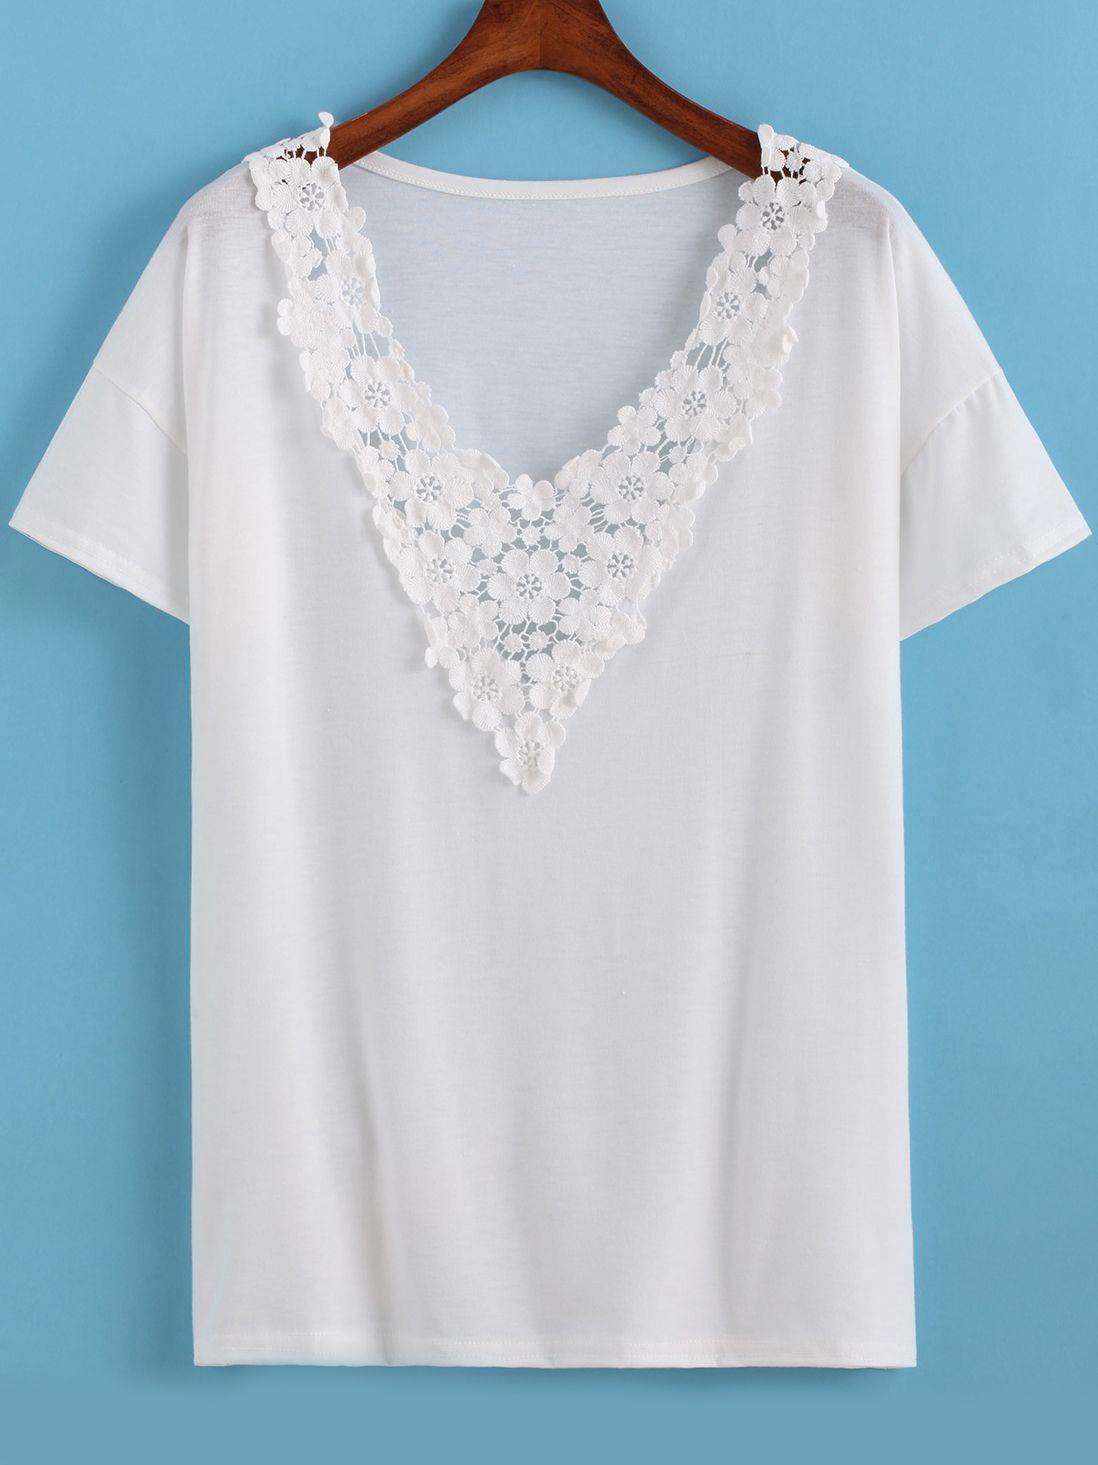 Camiseta cuello V flores crochet -blanco | Camisetas | Pinterest ...